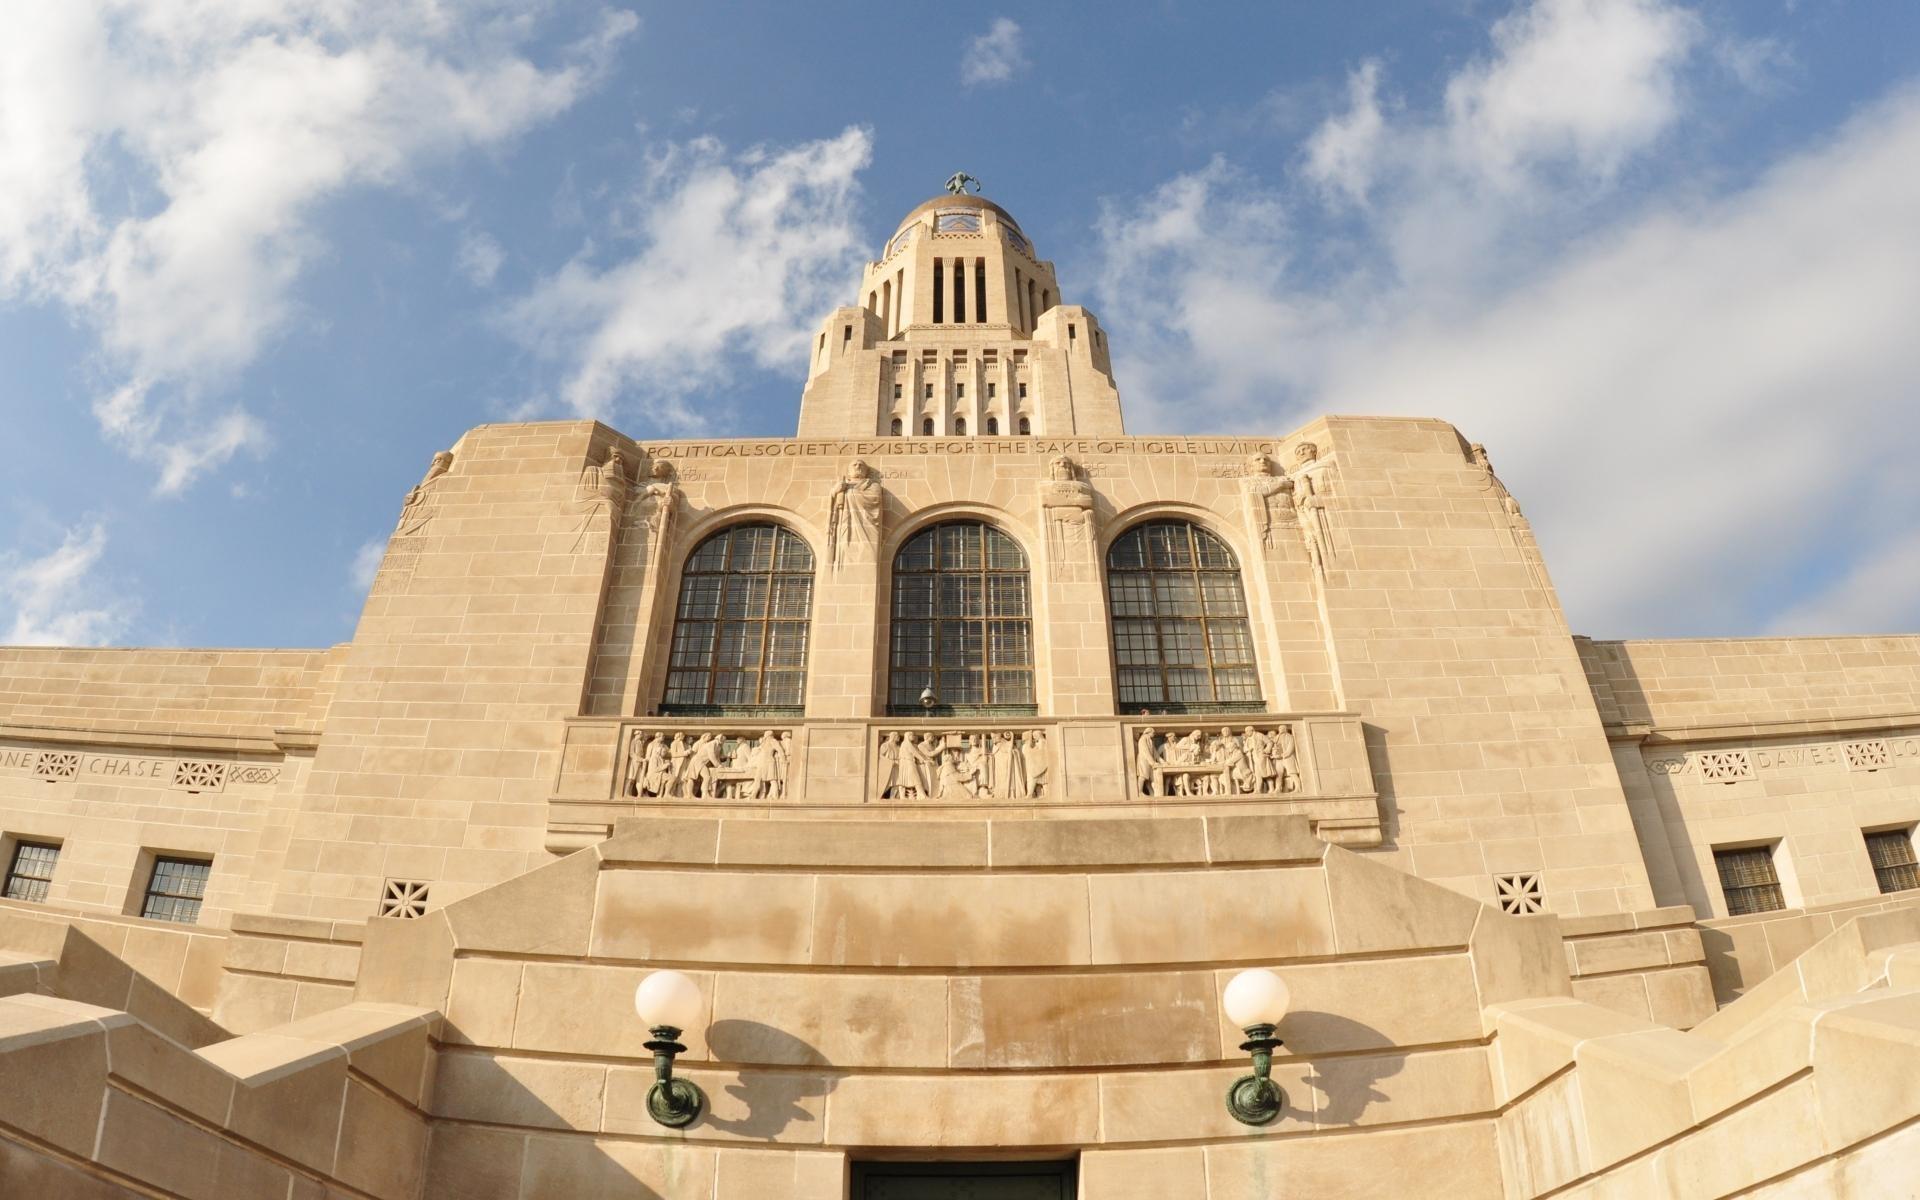 Nebraska State Capitol front side